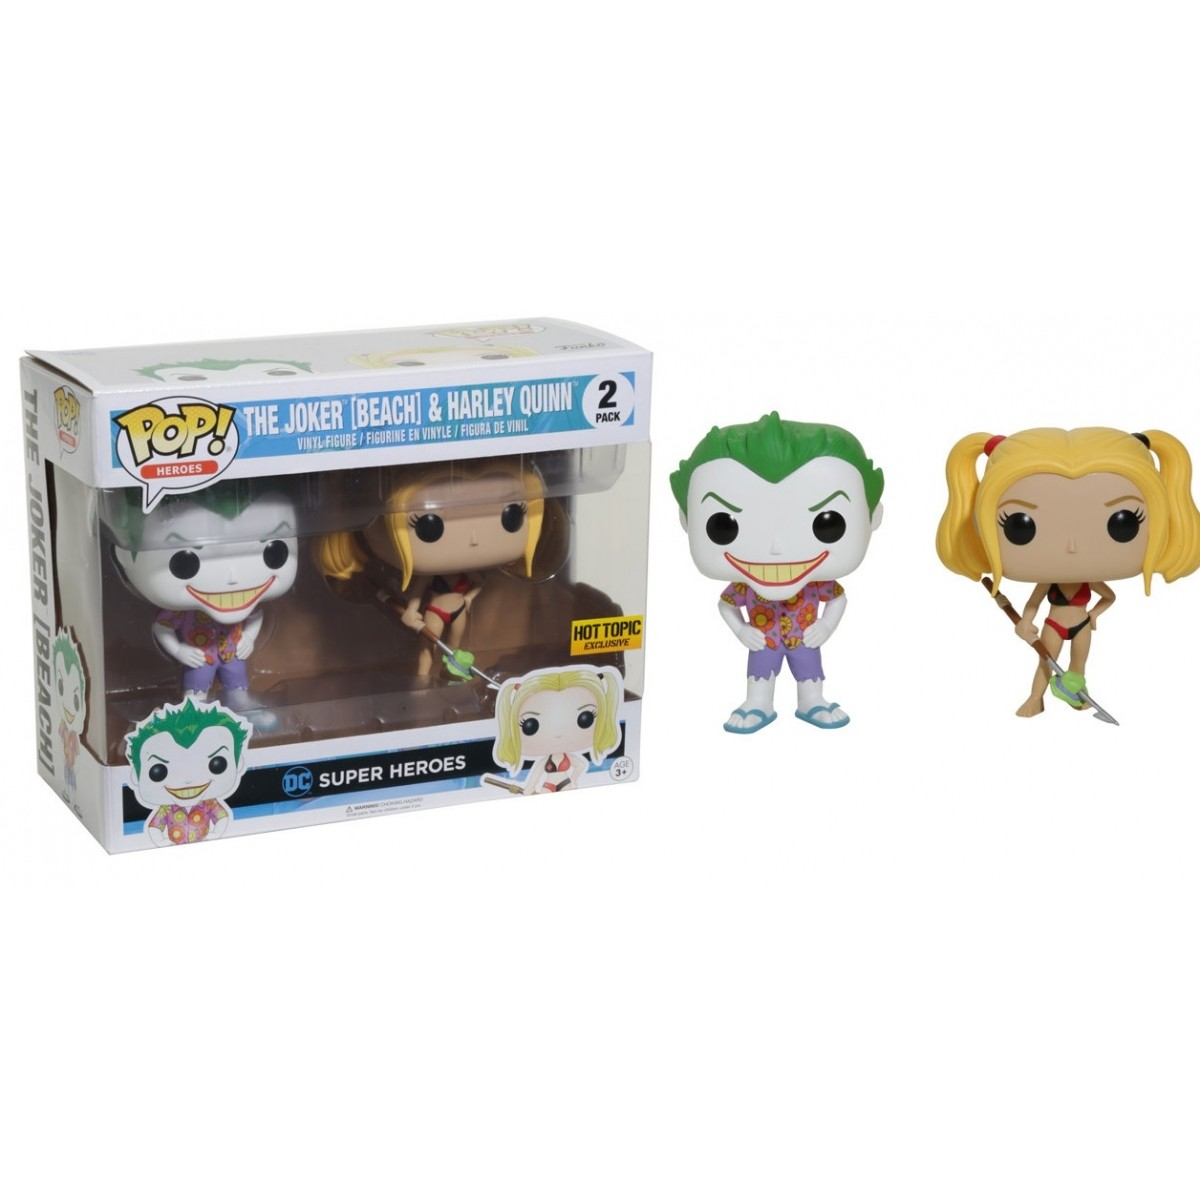 Funko Pop Coringa e Harley Quinn Roupa de Praia (The Joker & Harley Quinn): DC Super Heroes Exclusivo #2 - Funko